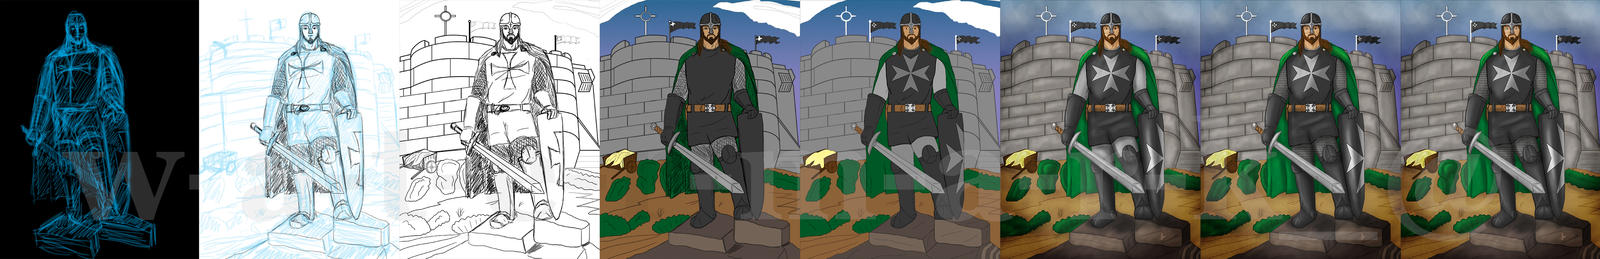 Knights Hospitaller Frappiller Work Flow by jornas